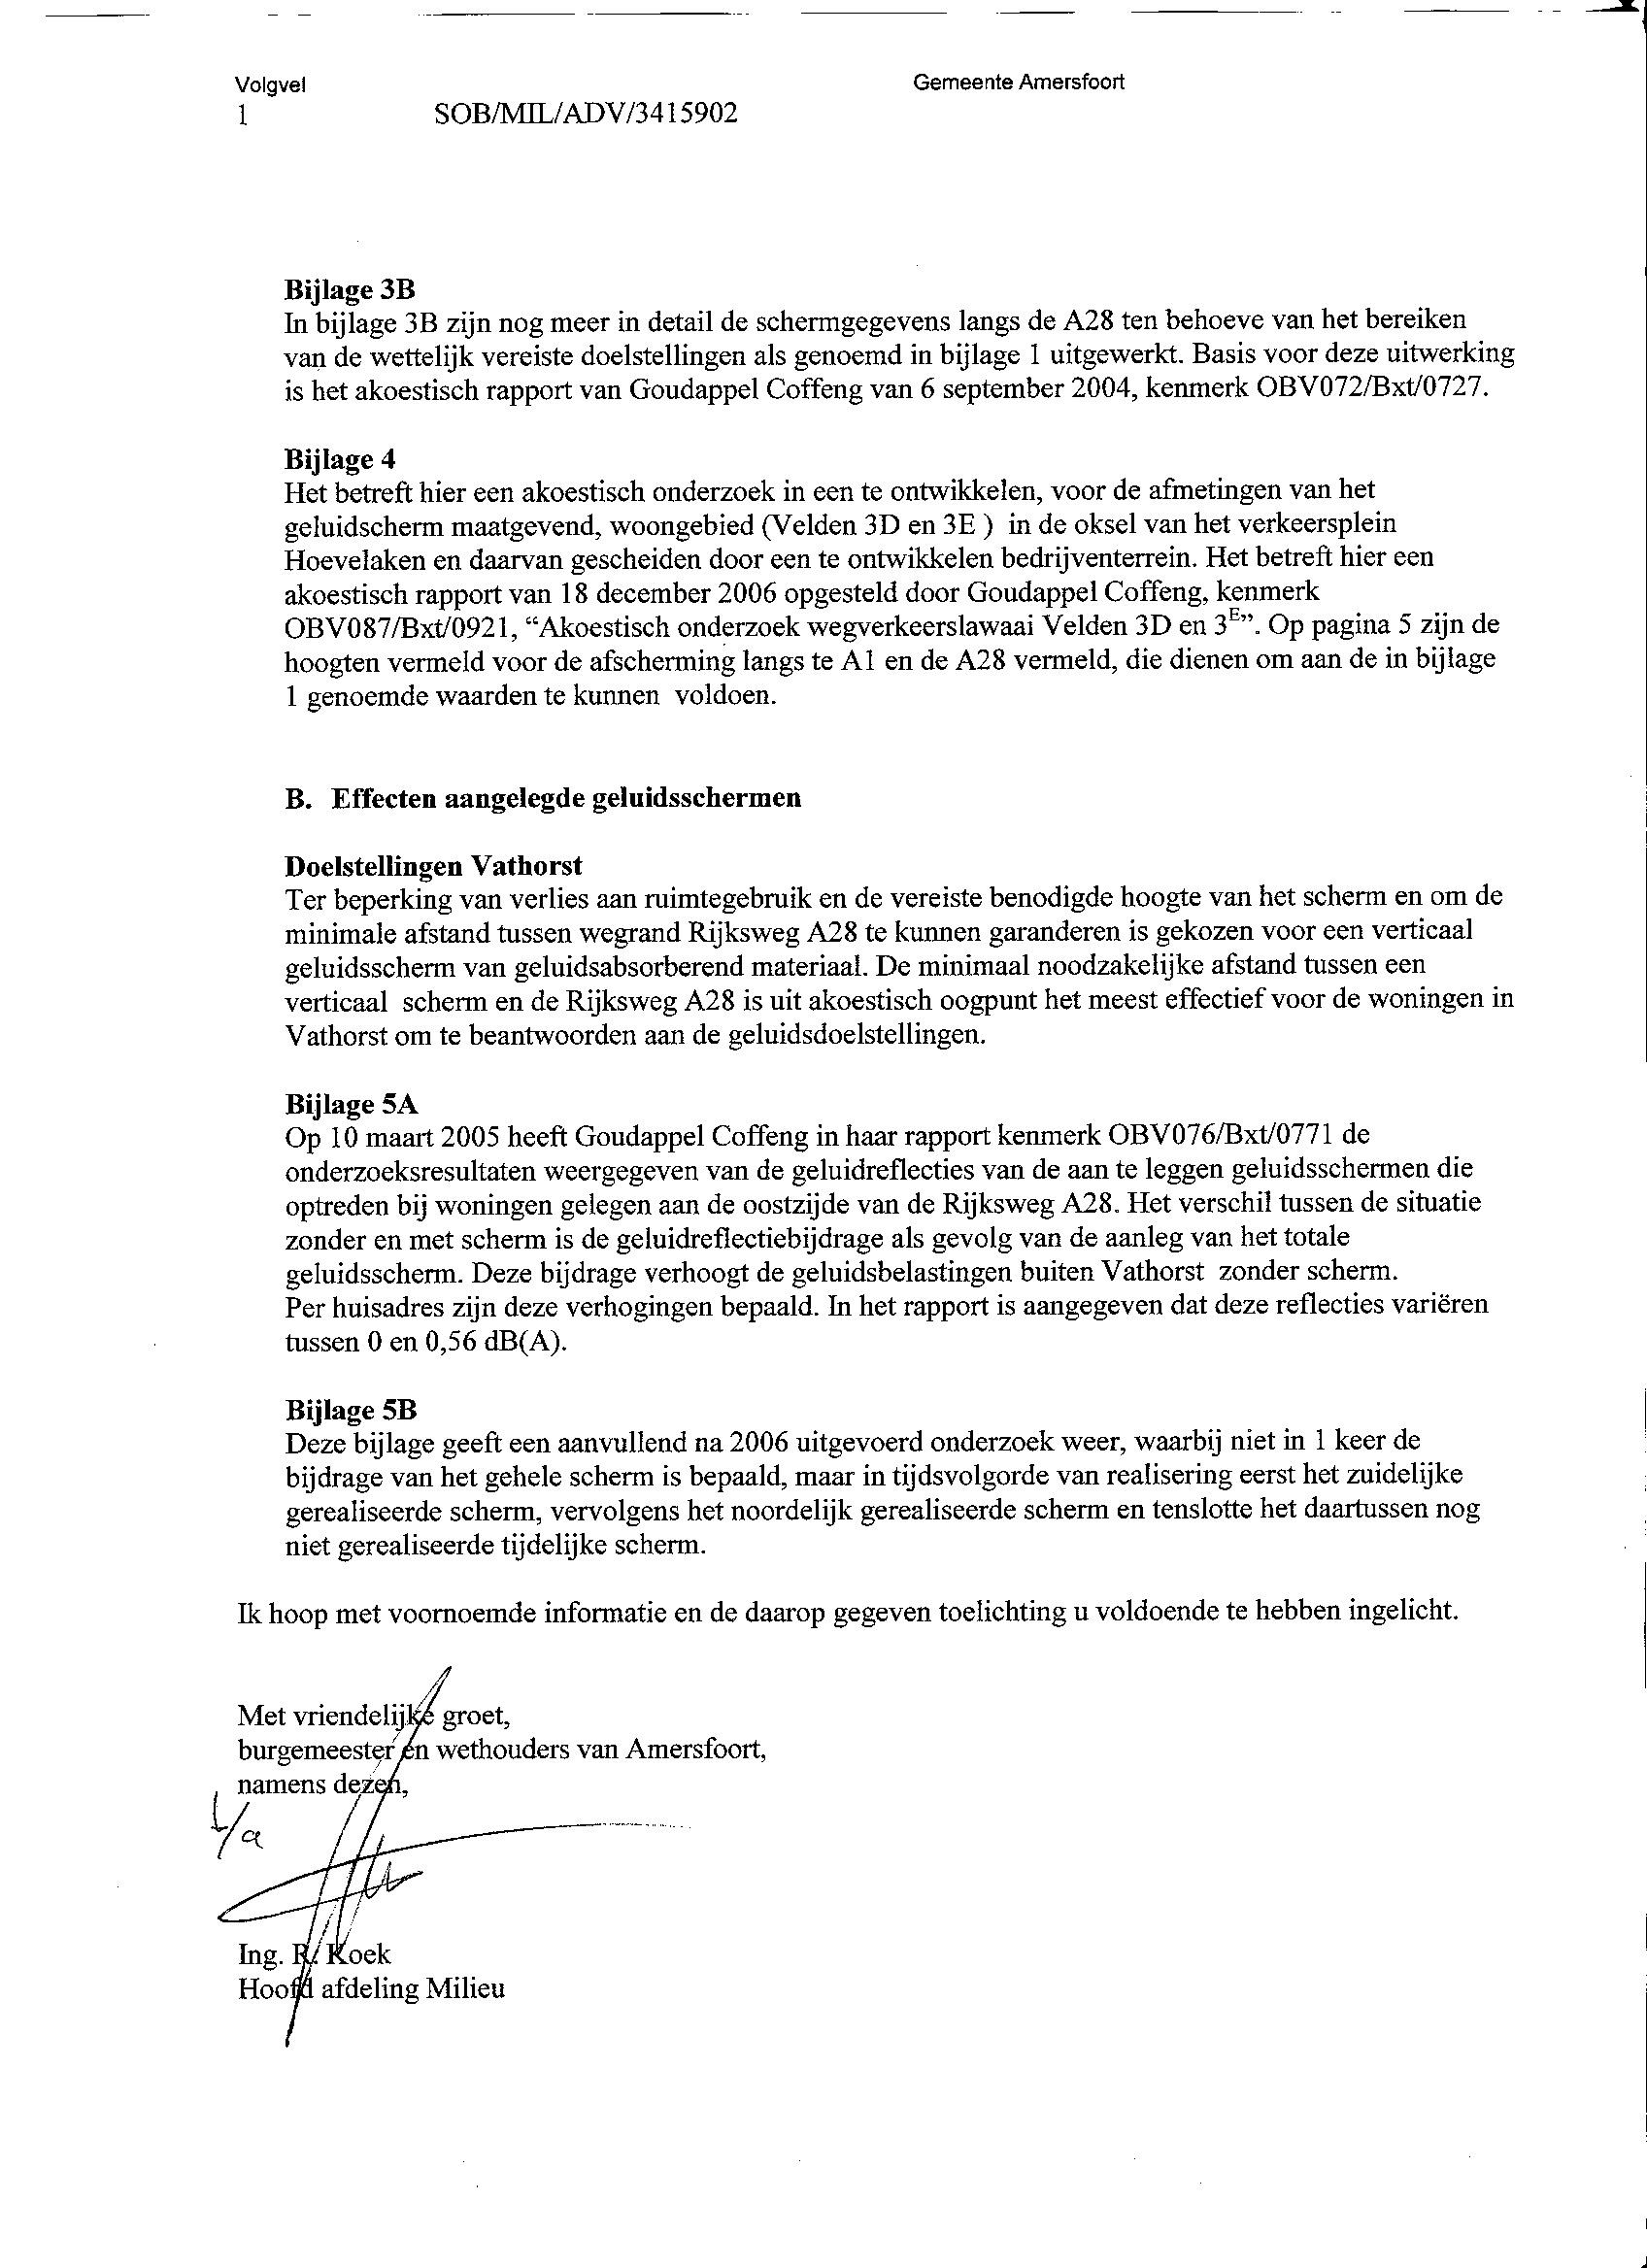 goede afsluiting brief Afsluiting Brief Namens | gantinova